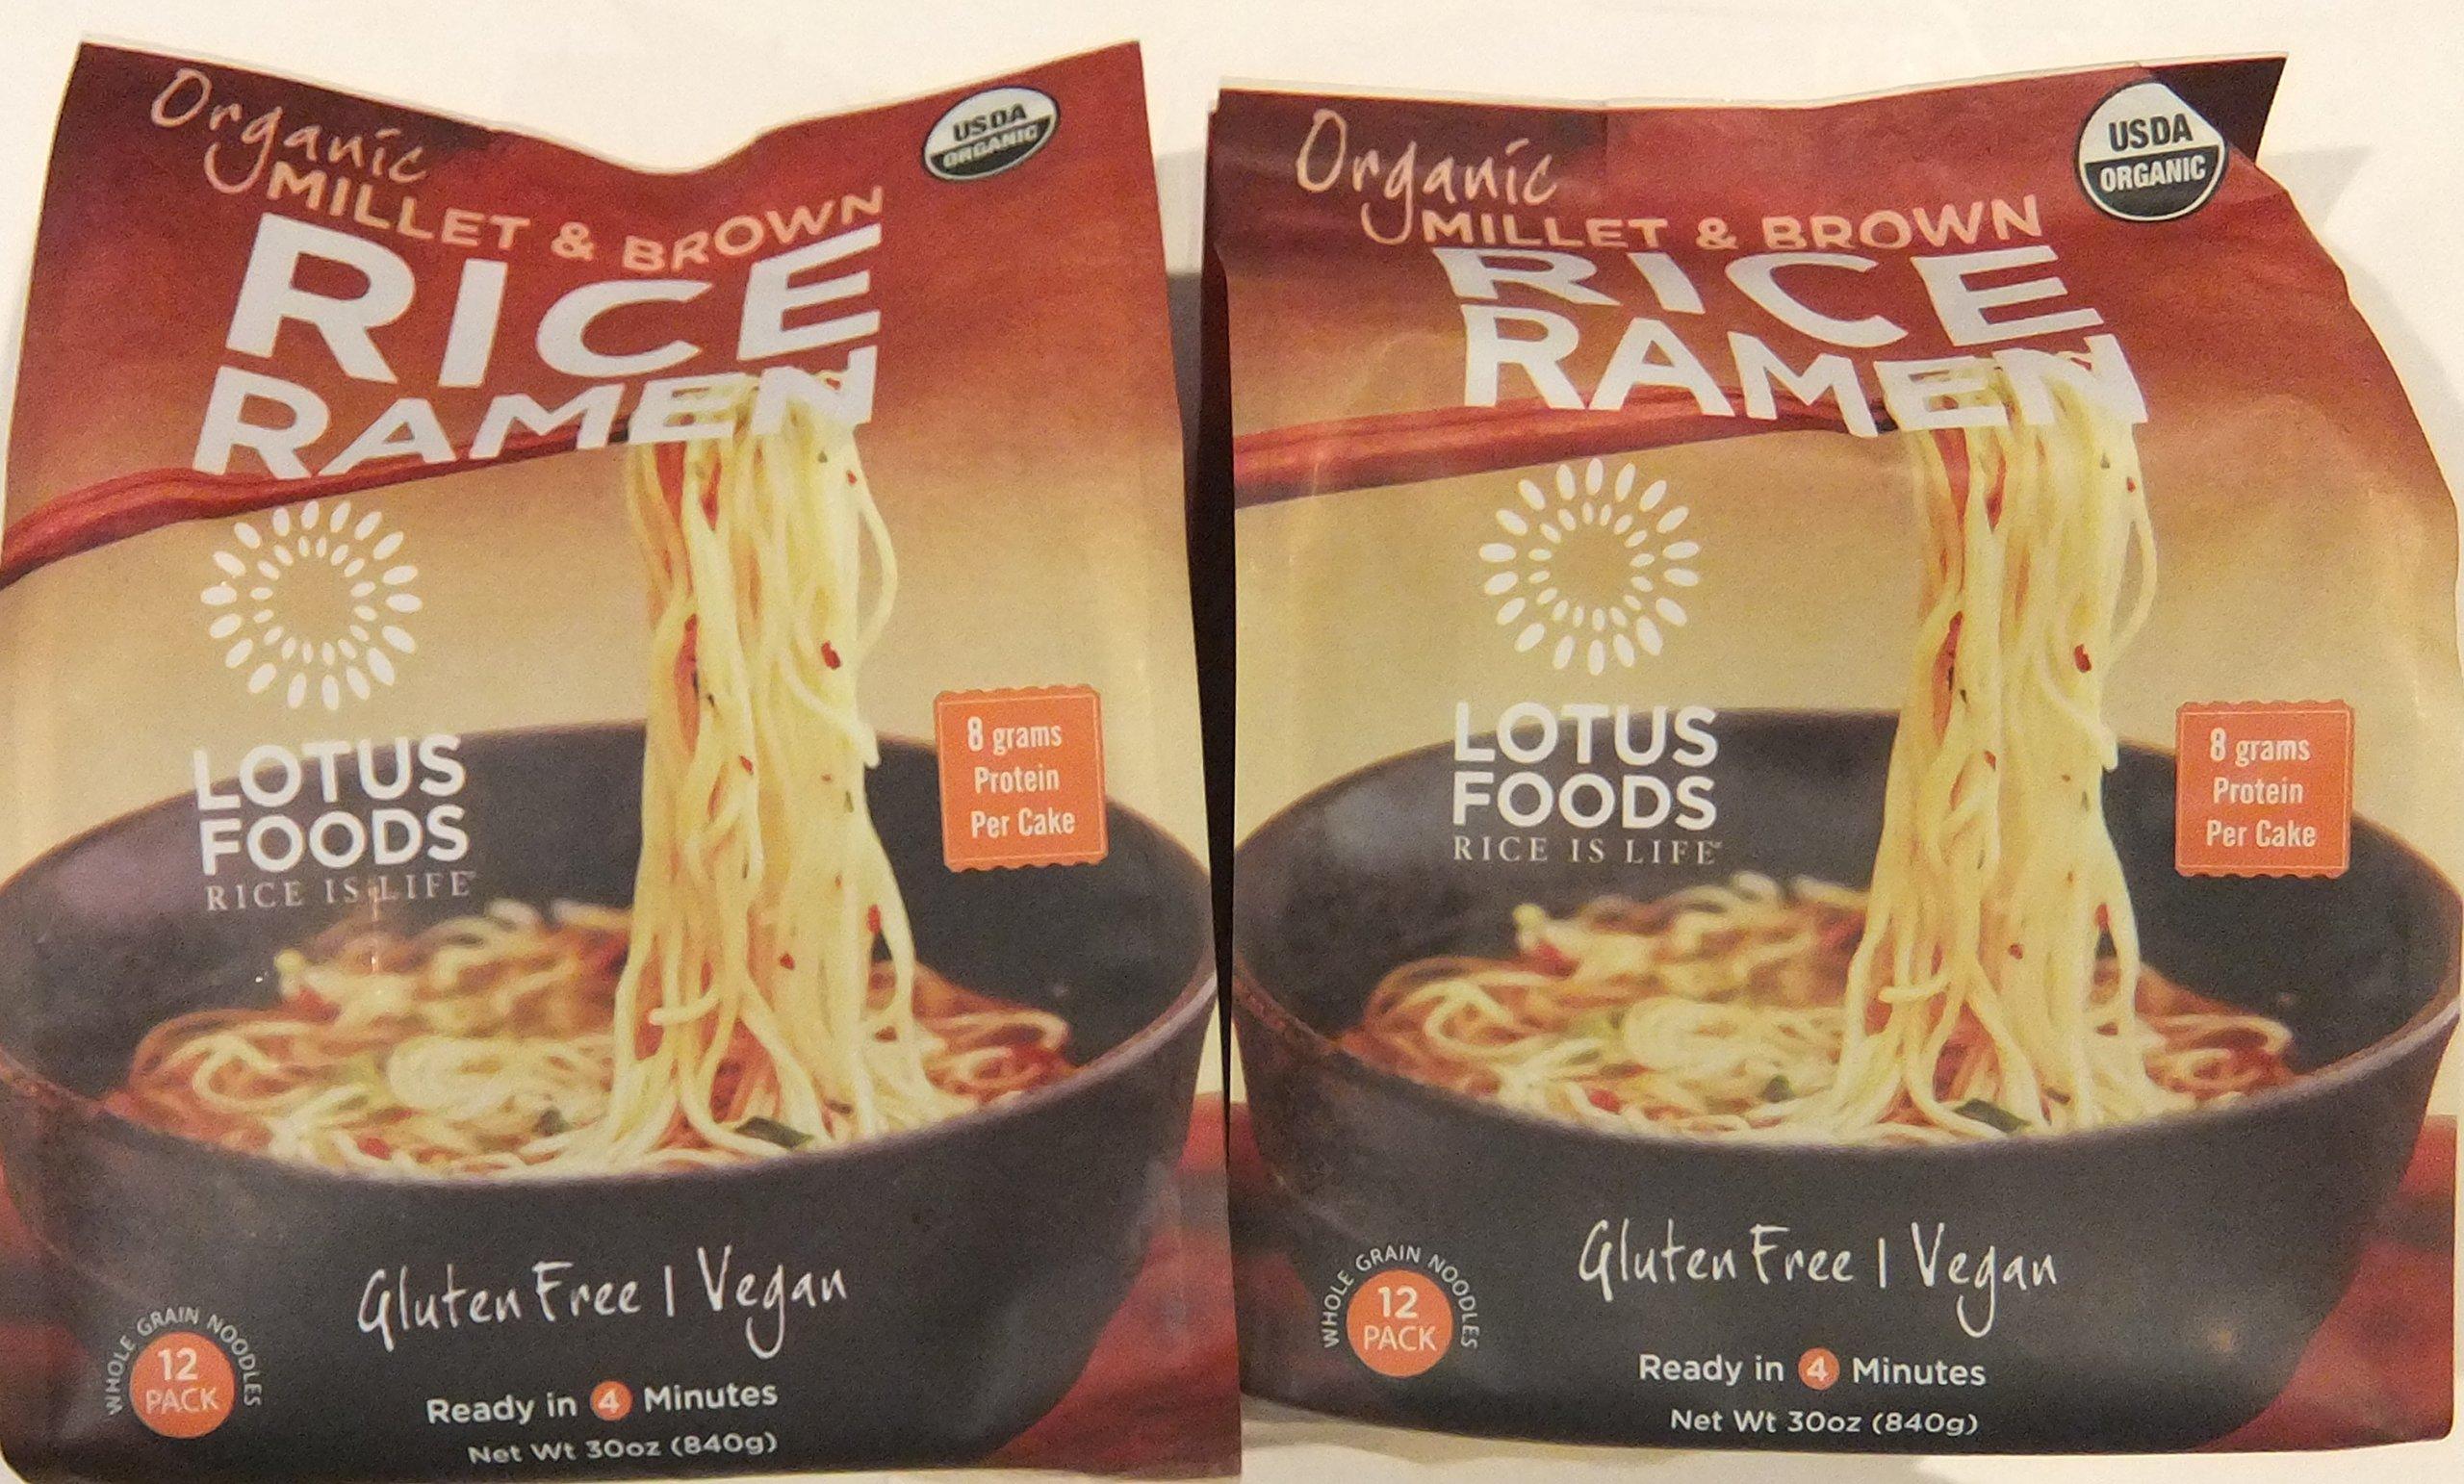 Lotus Foods Organic Millet & Brown Rice Ramen, 12 Pack (Pack of 2)